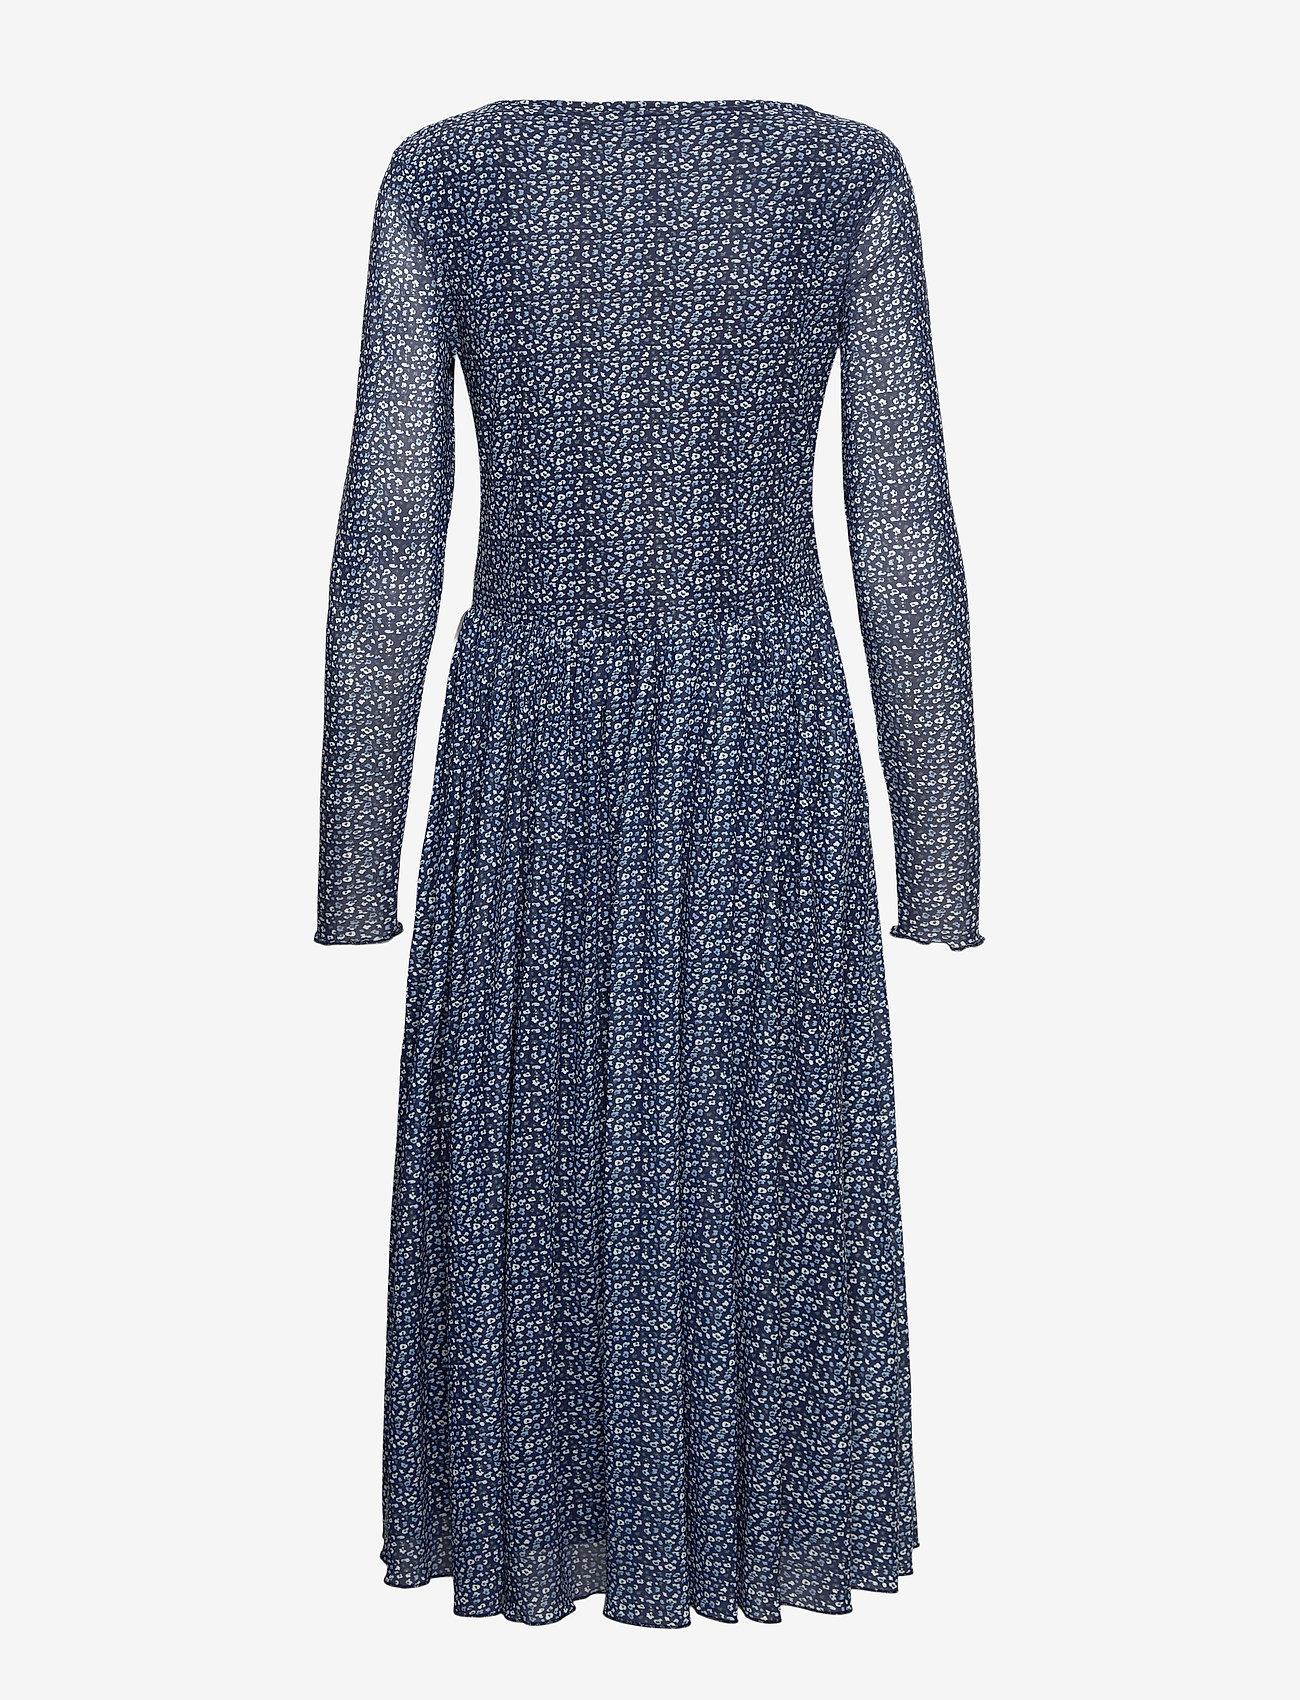 Soyaconcept - SC-ALDA - everyday dresses - bright blue combi - 1